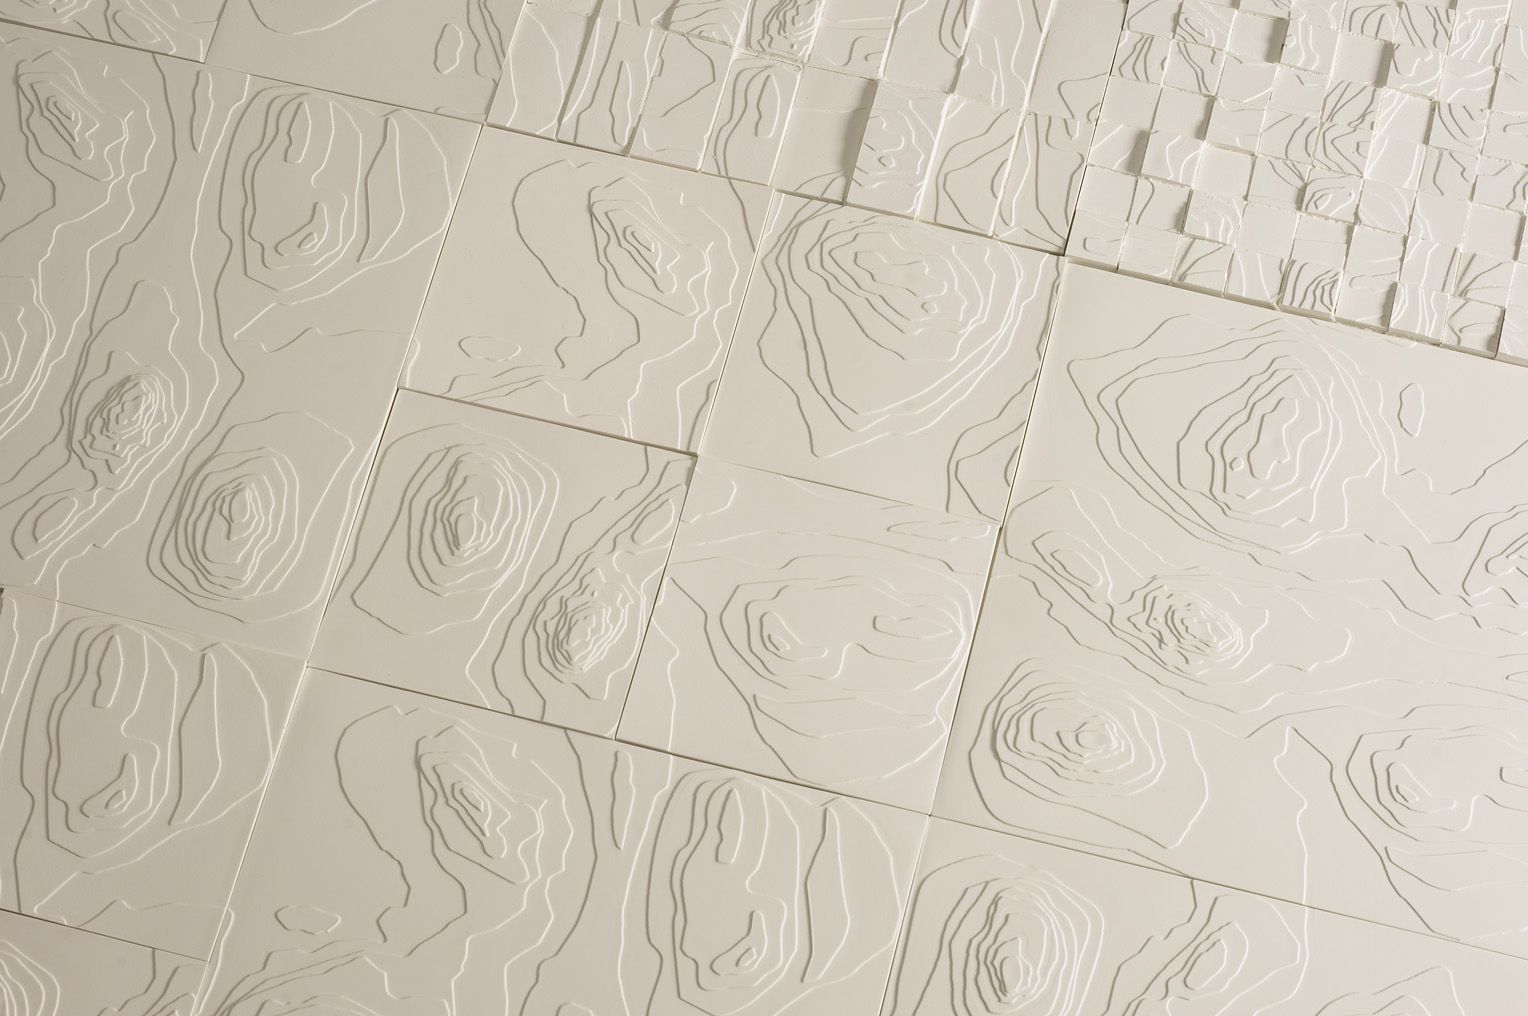 Amazing topography ceramic tiles by osuma design osumadesignc amazing topography ceramic tiles by osuma design handmade tiles can be customized dailygadgetfo Images